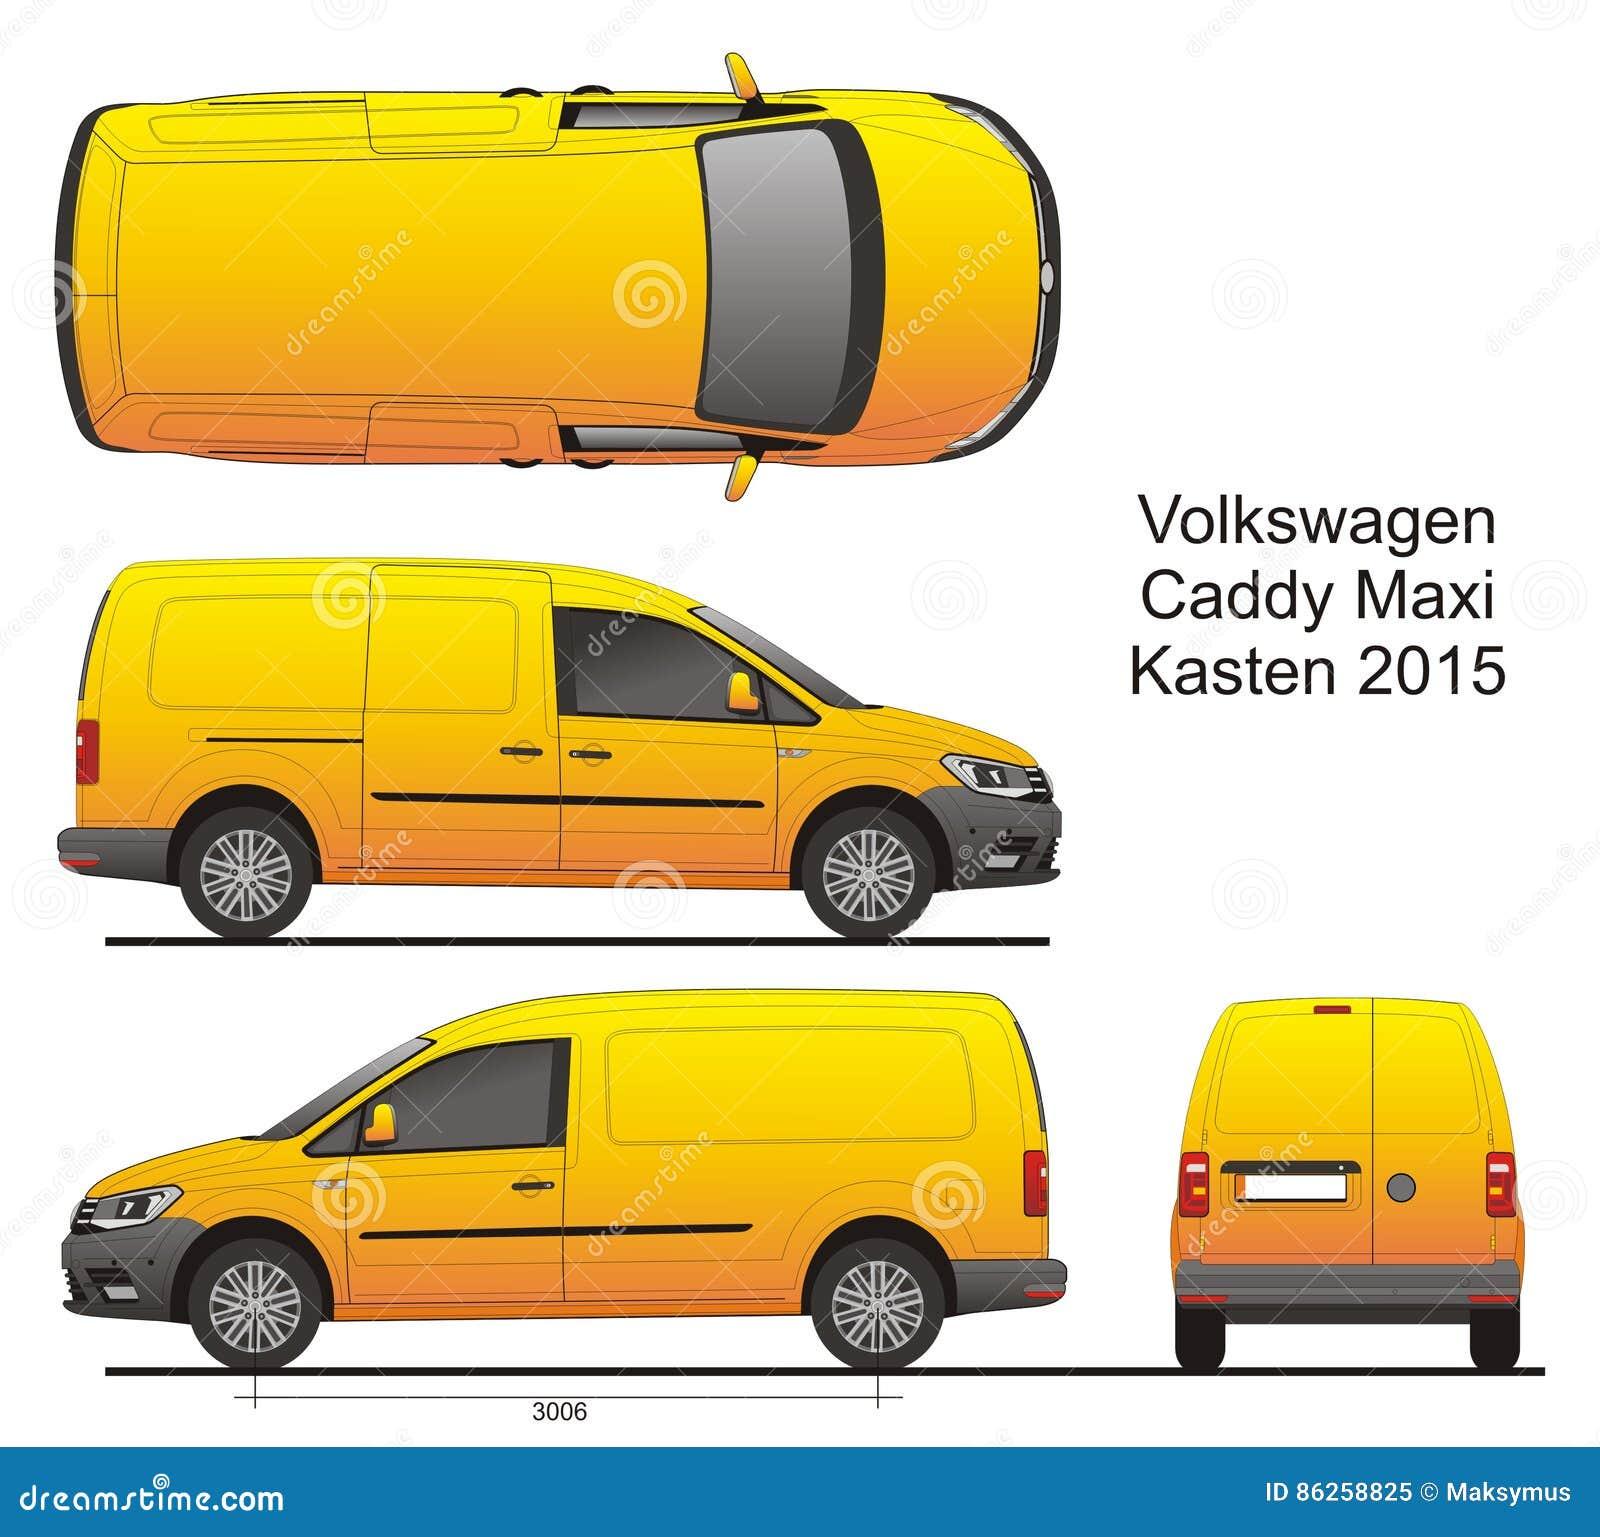 Vw Caddy Maxi Kasten 2015 Editorial Image Illustration Of